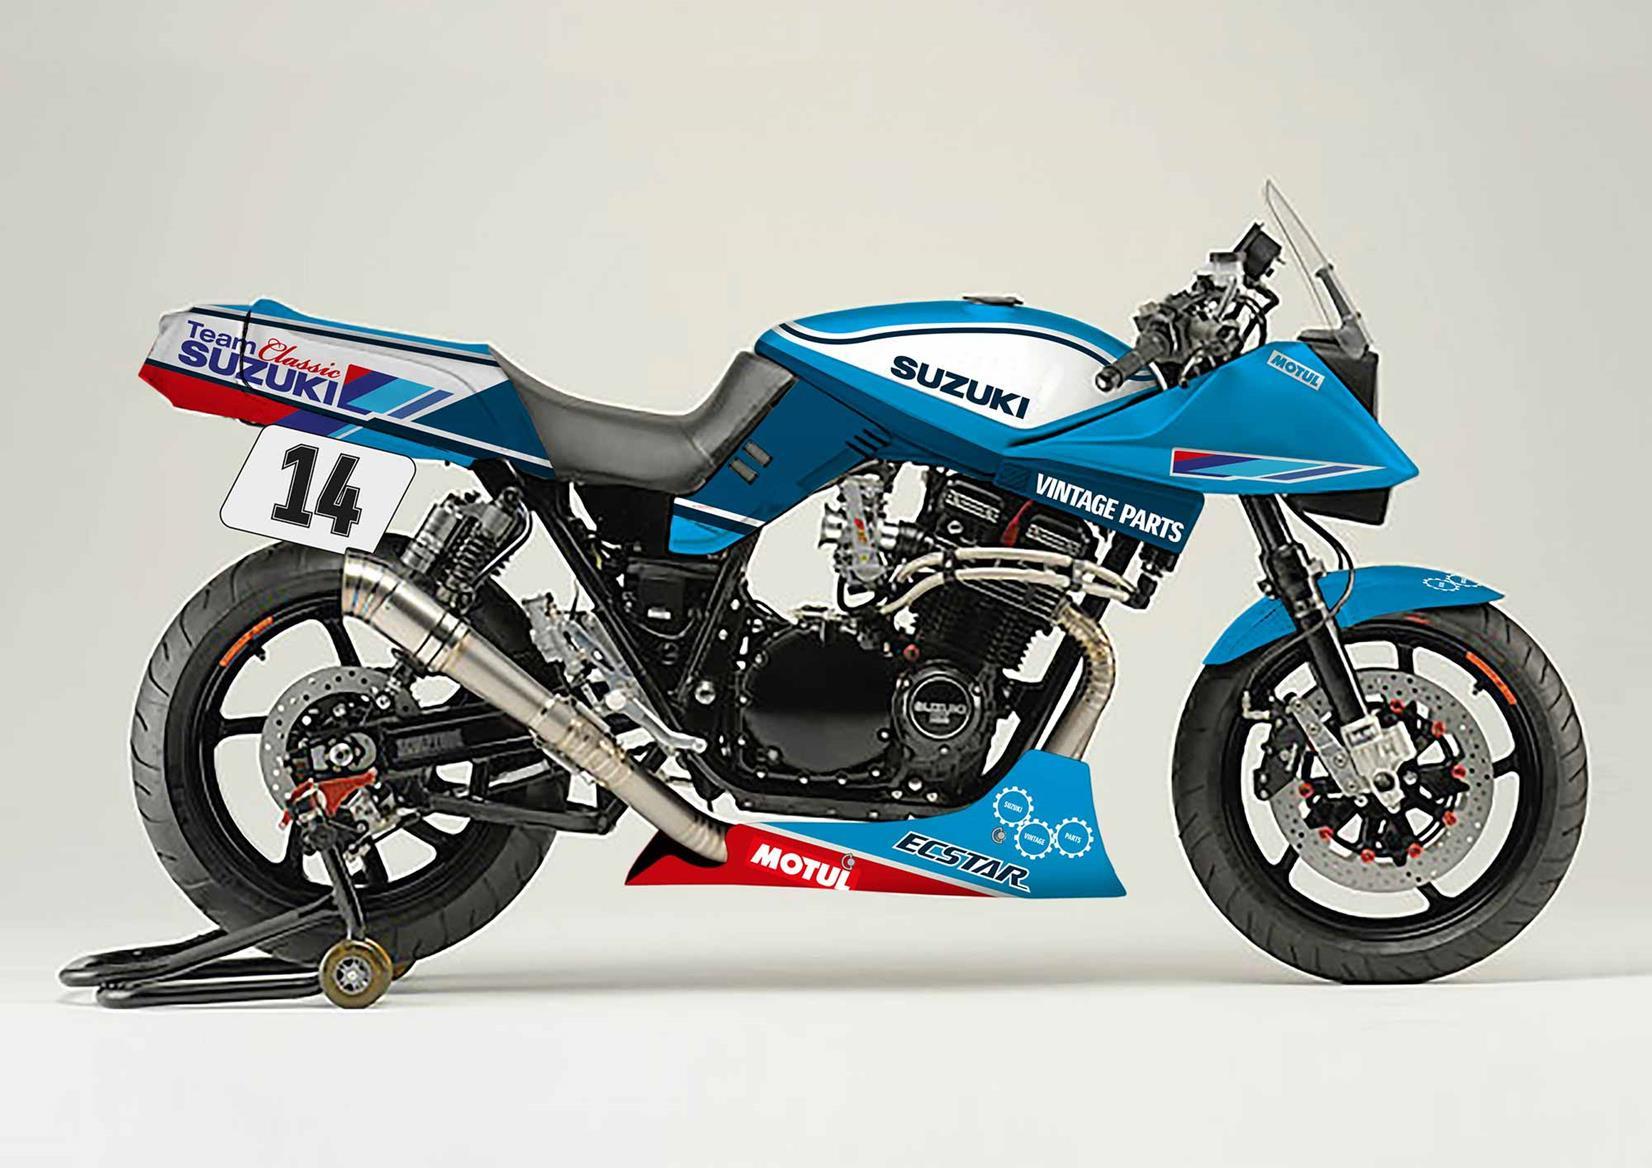 The Team Classic Suzuki Katana